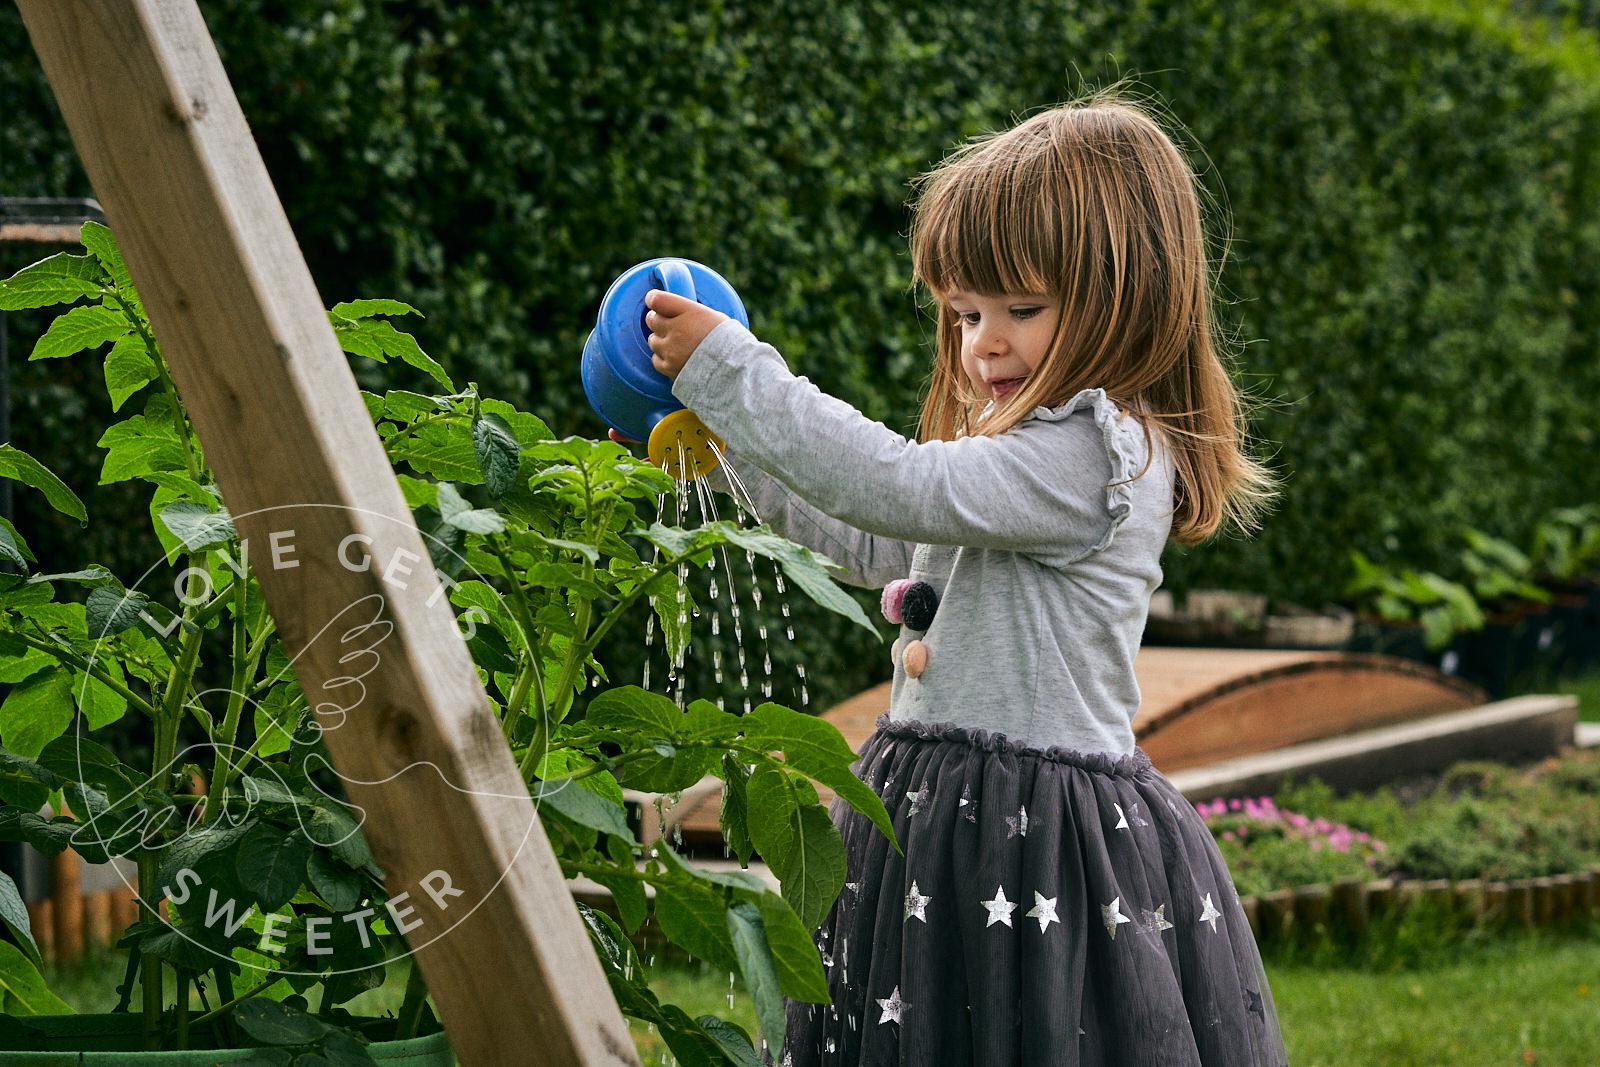 toddler waters plants in family garden in Burscough